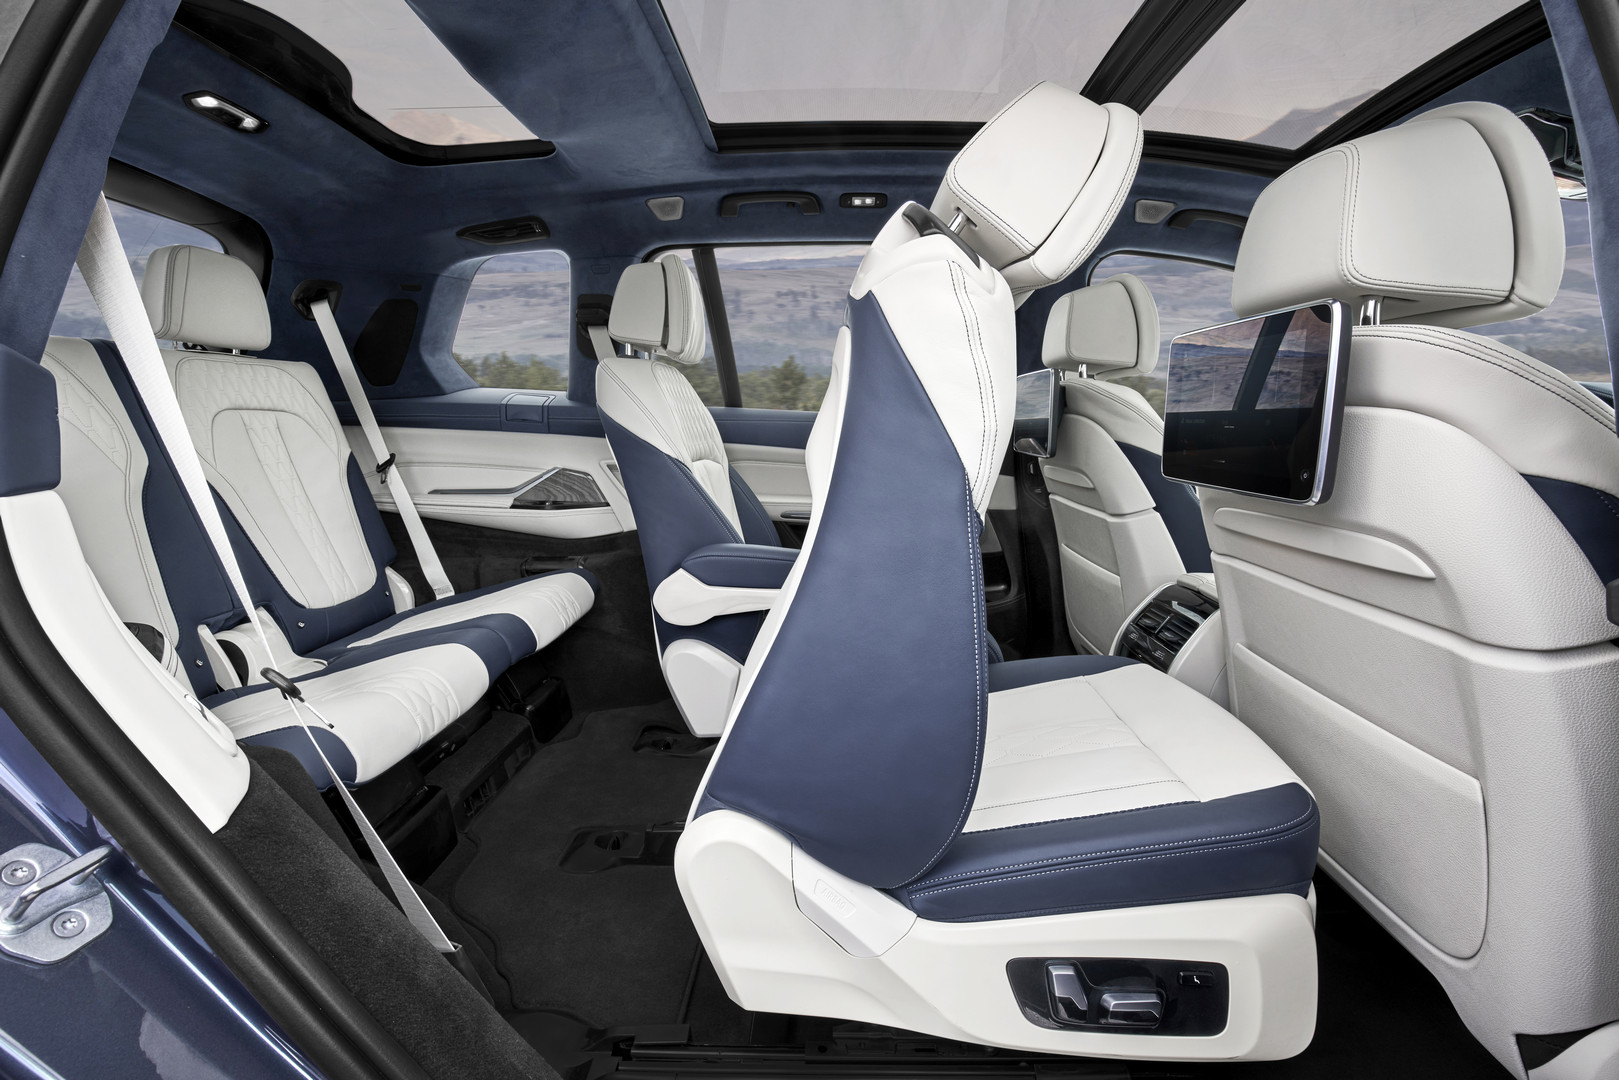 2019 BMW X7 Seats